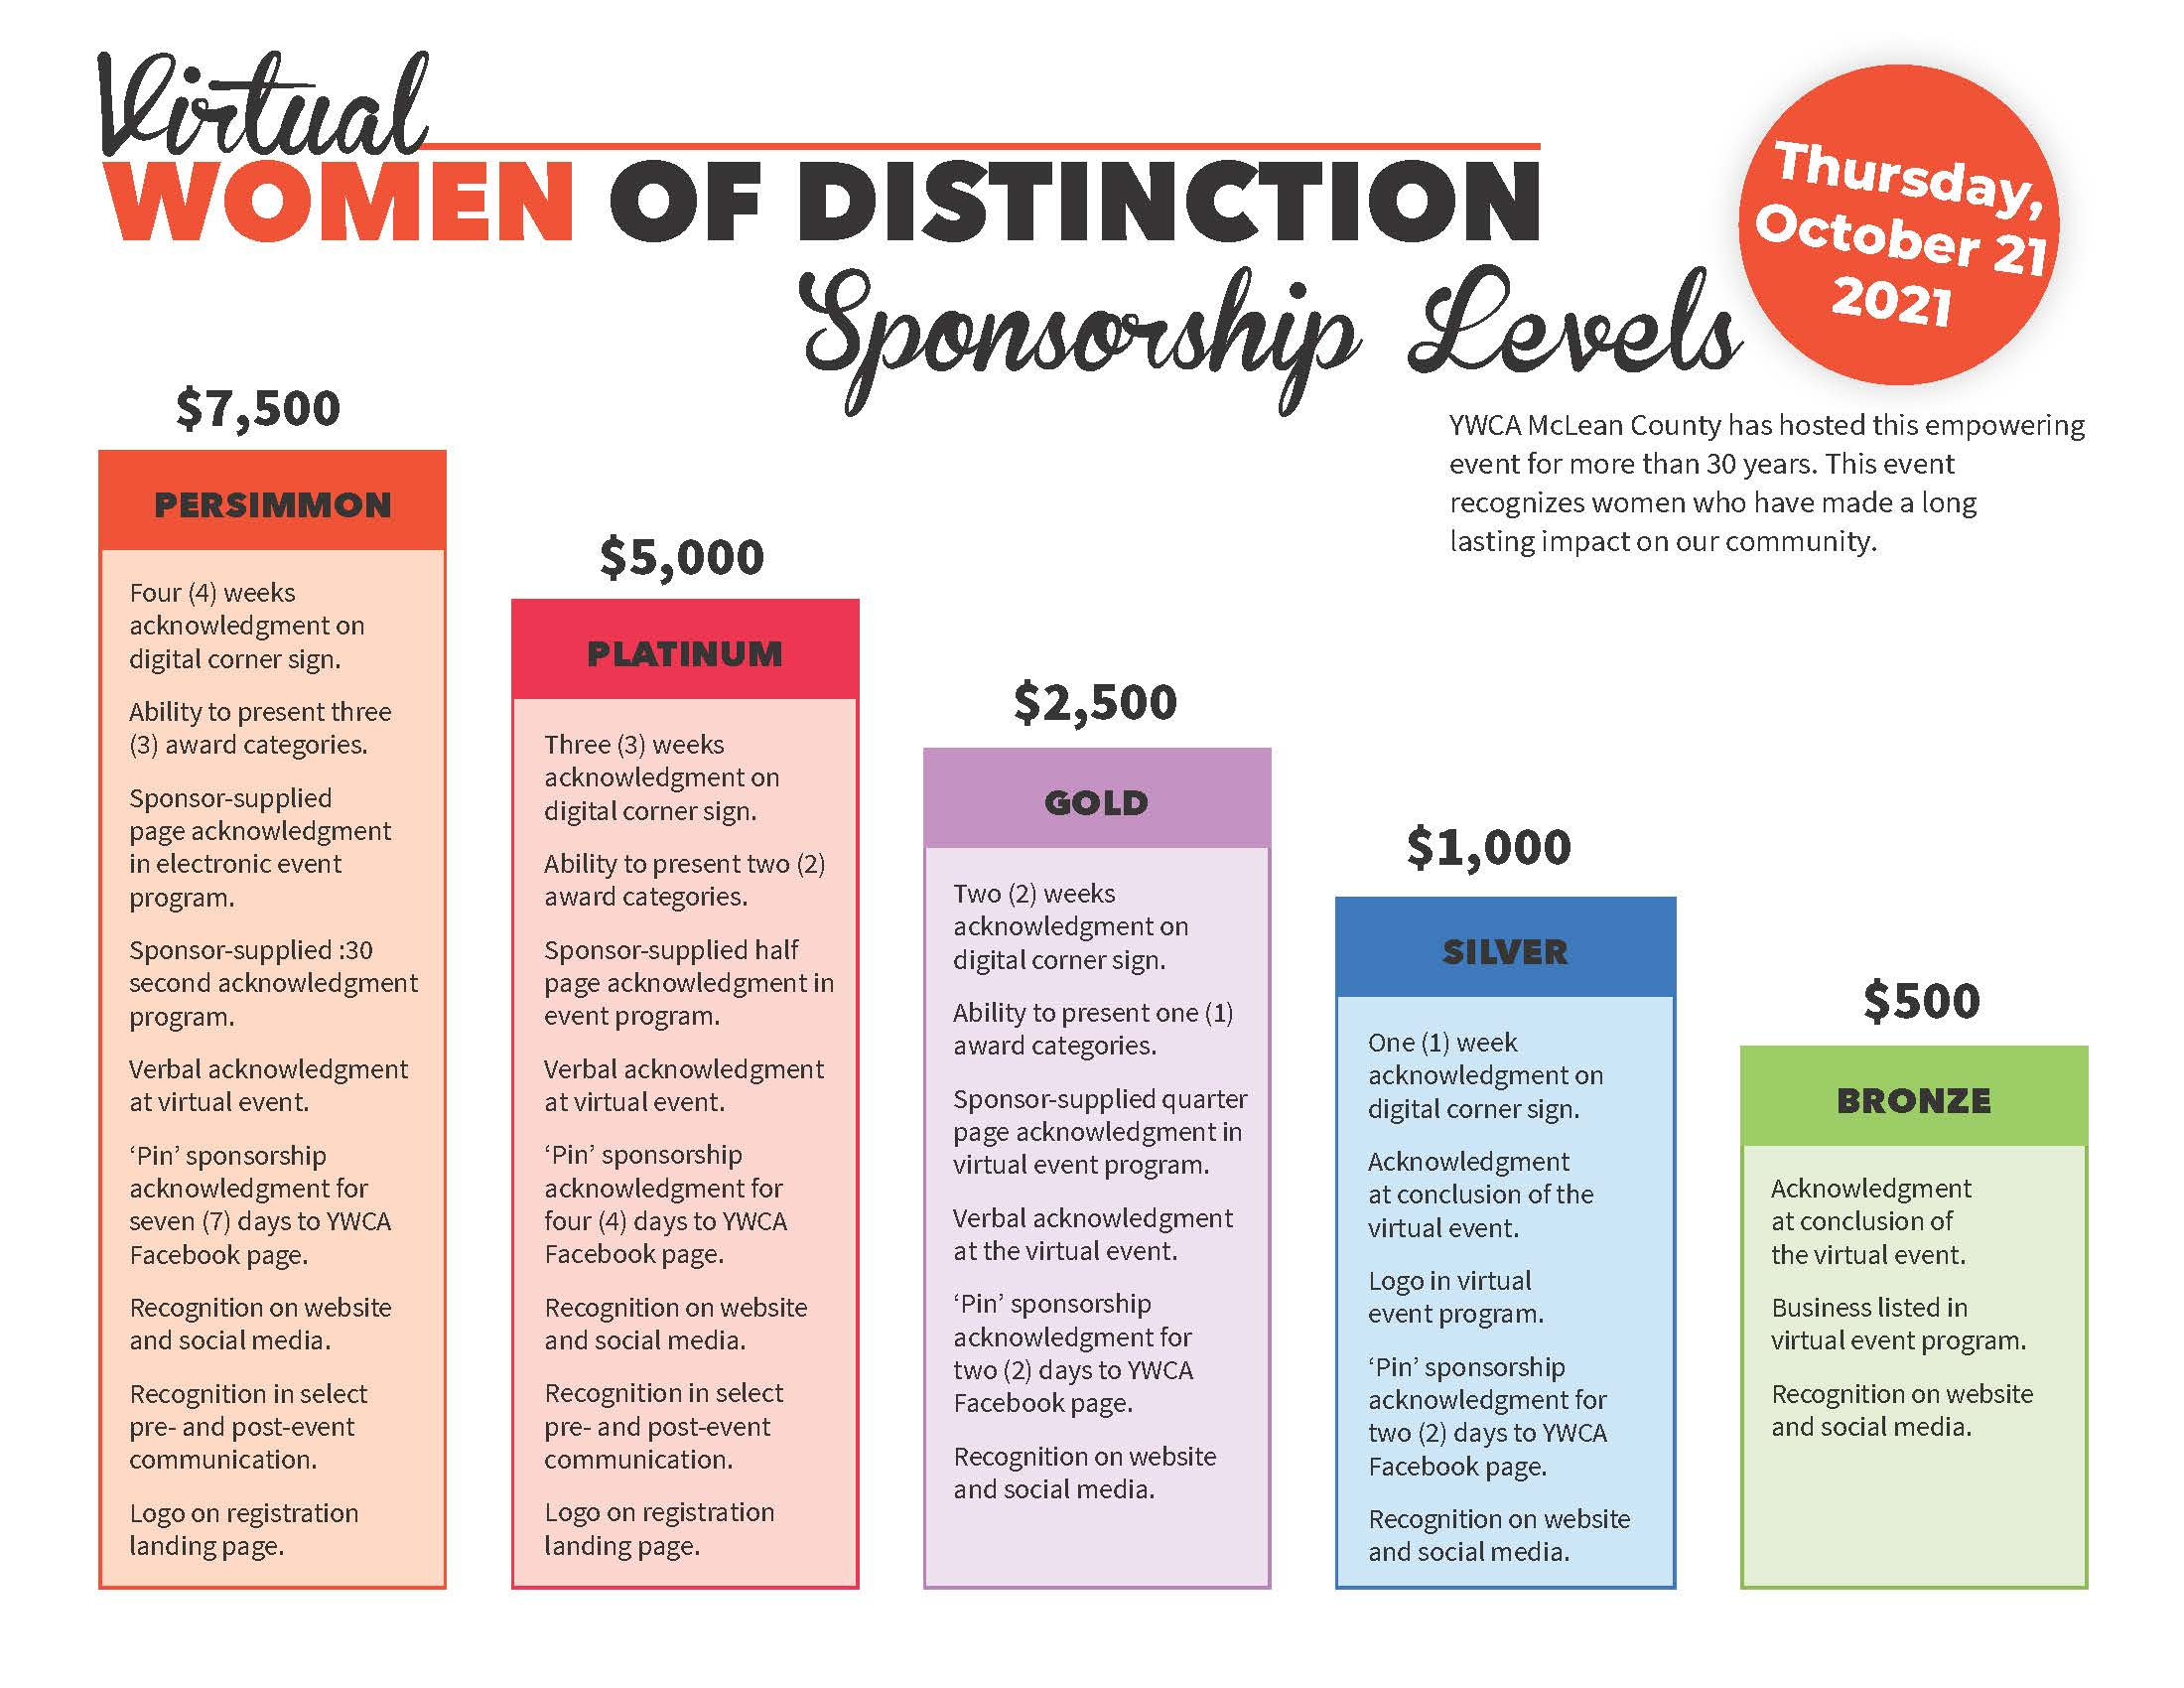 YWCA Women of Distinction Sponsorships 2021